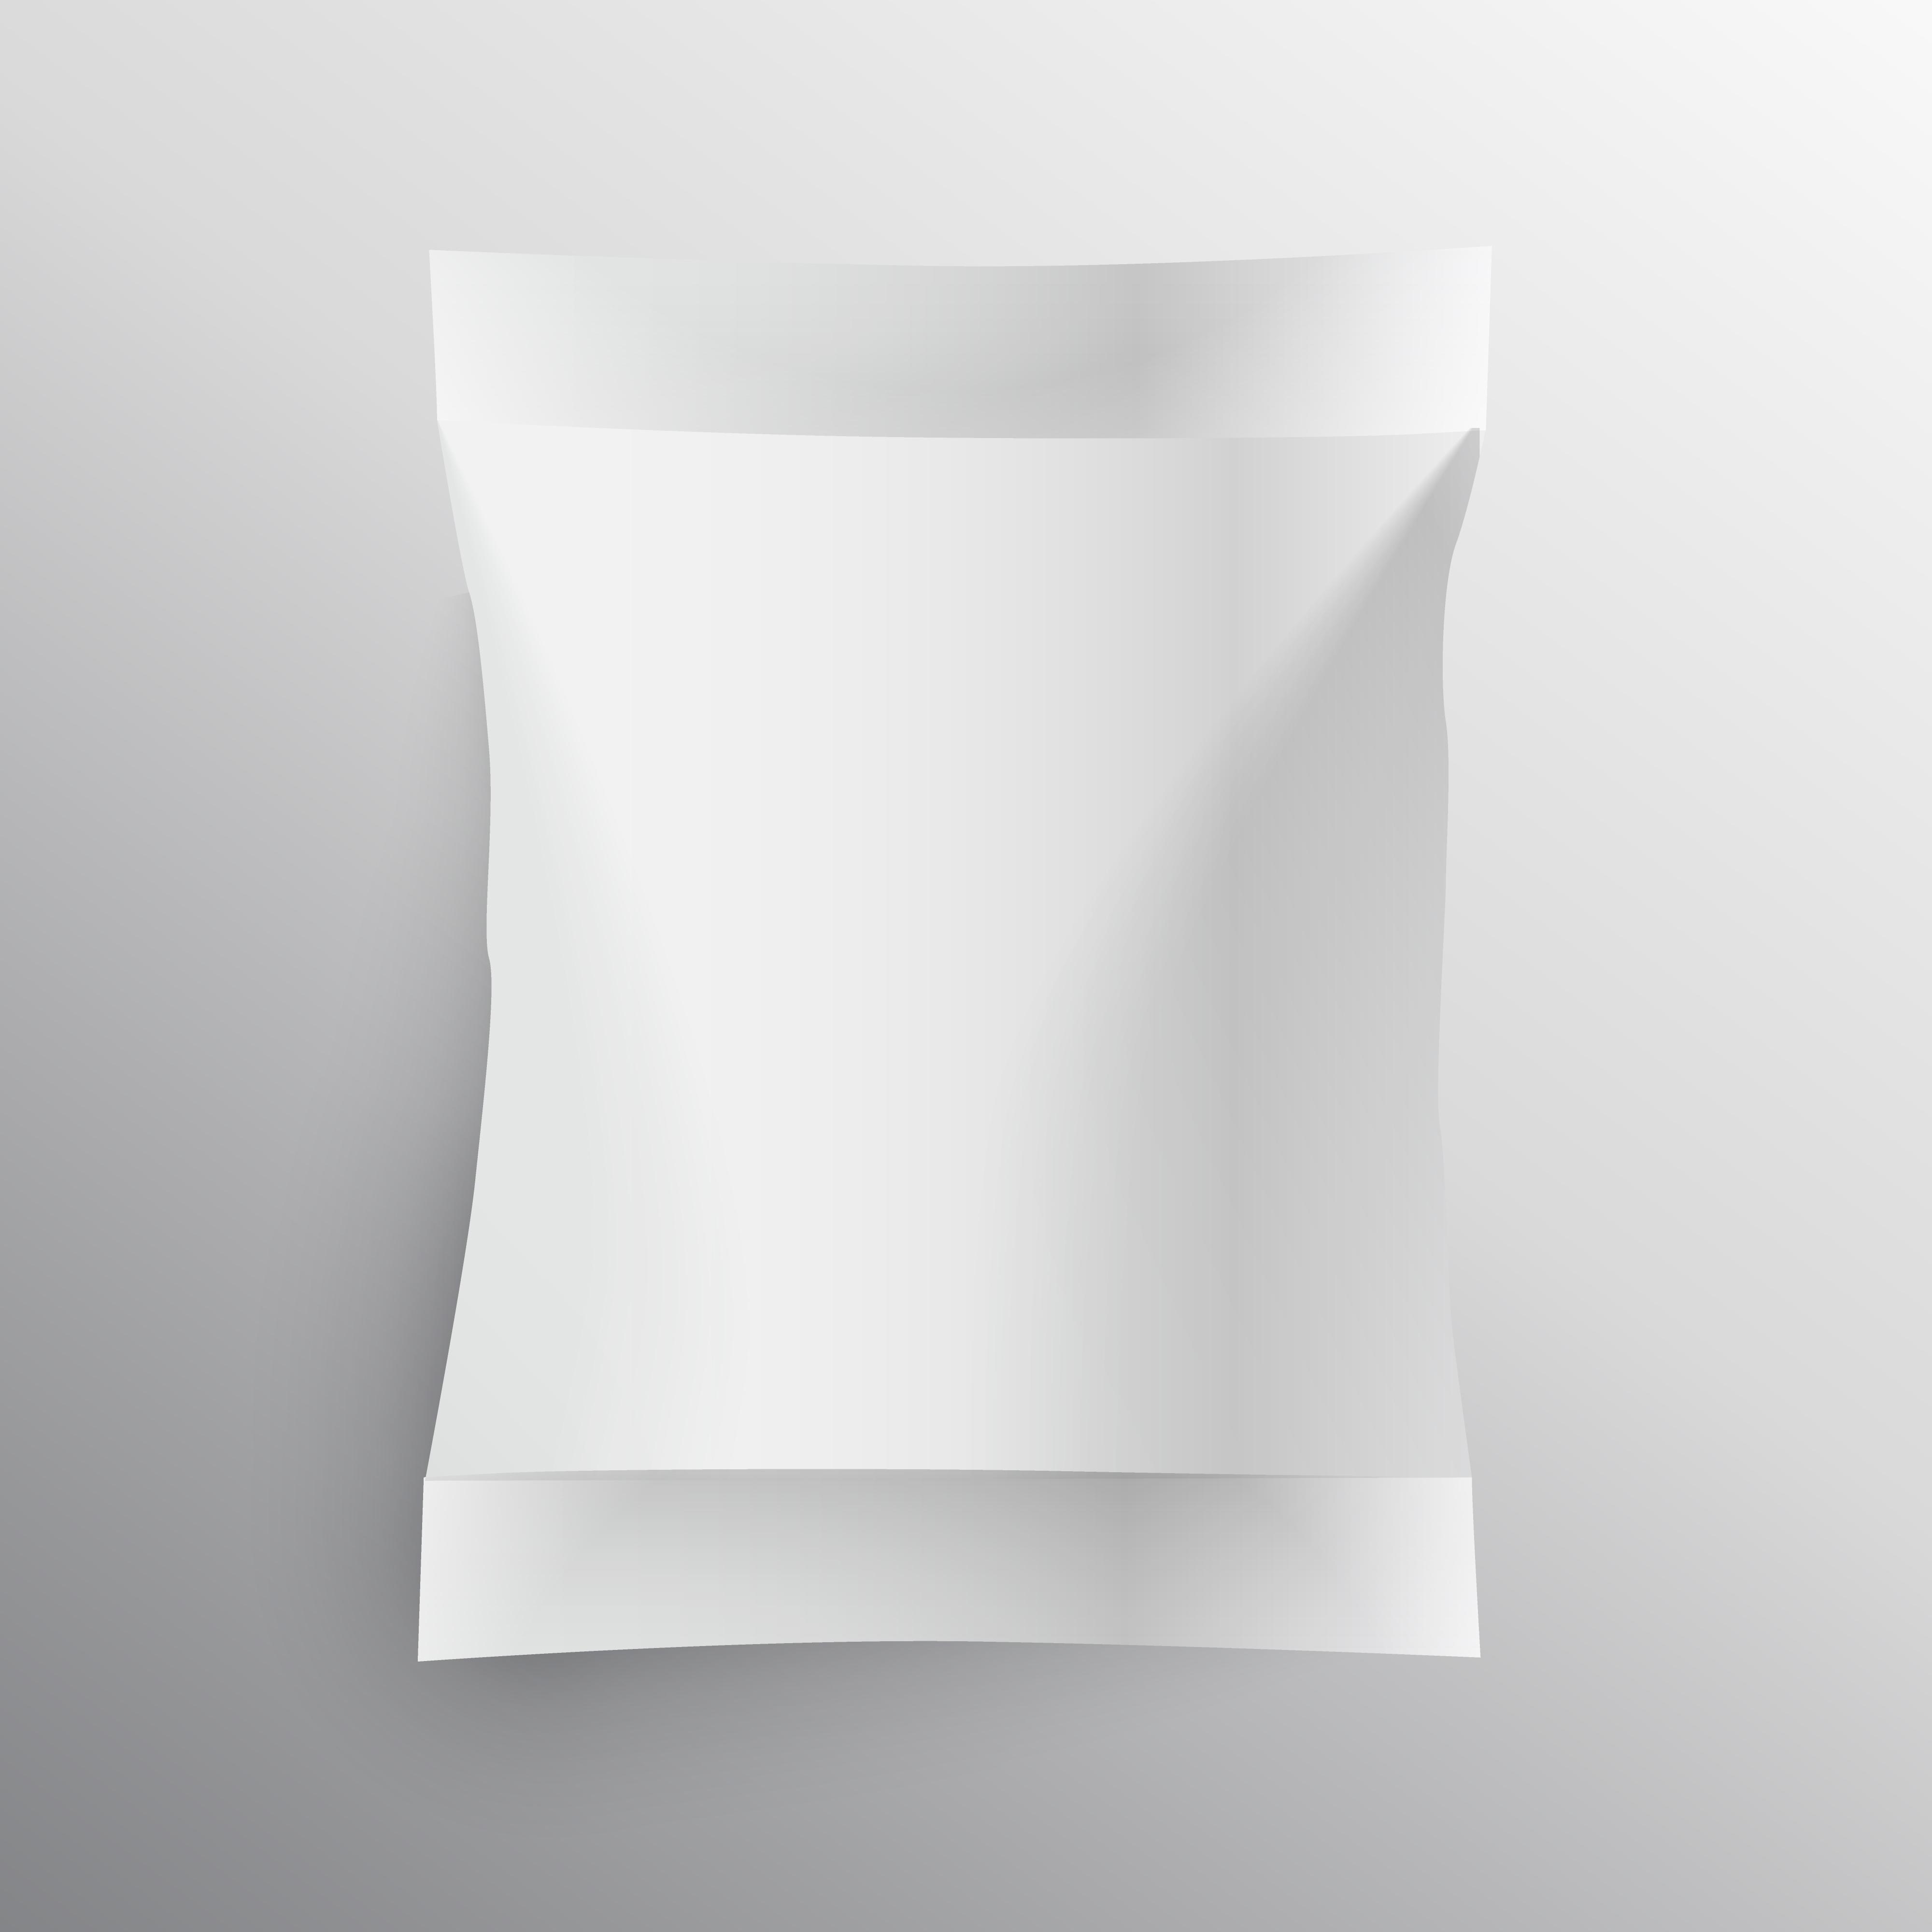 Sweet Wrapper Free Vector Art 4445 Free Downloads